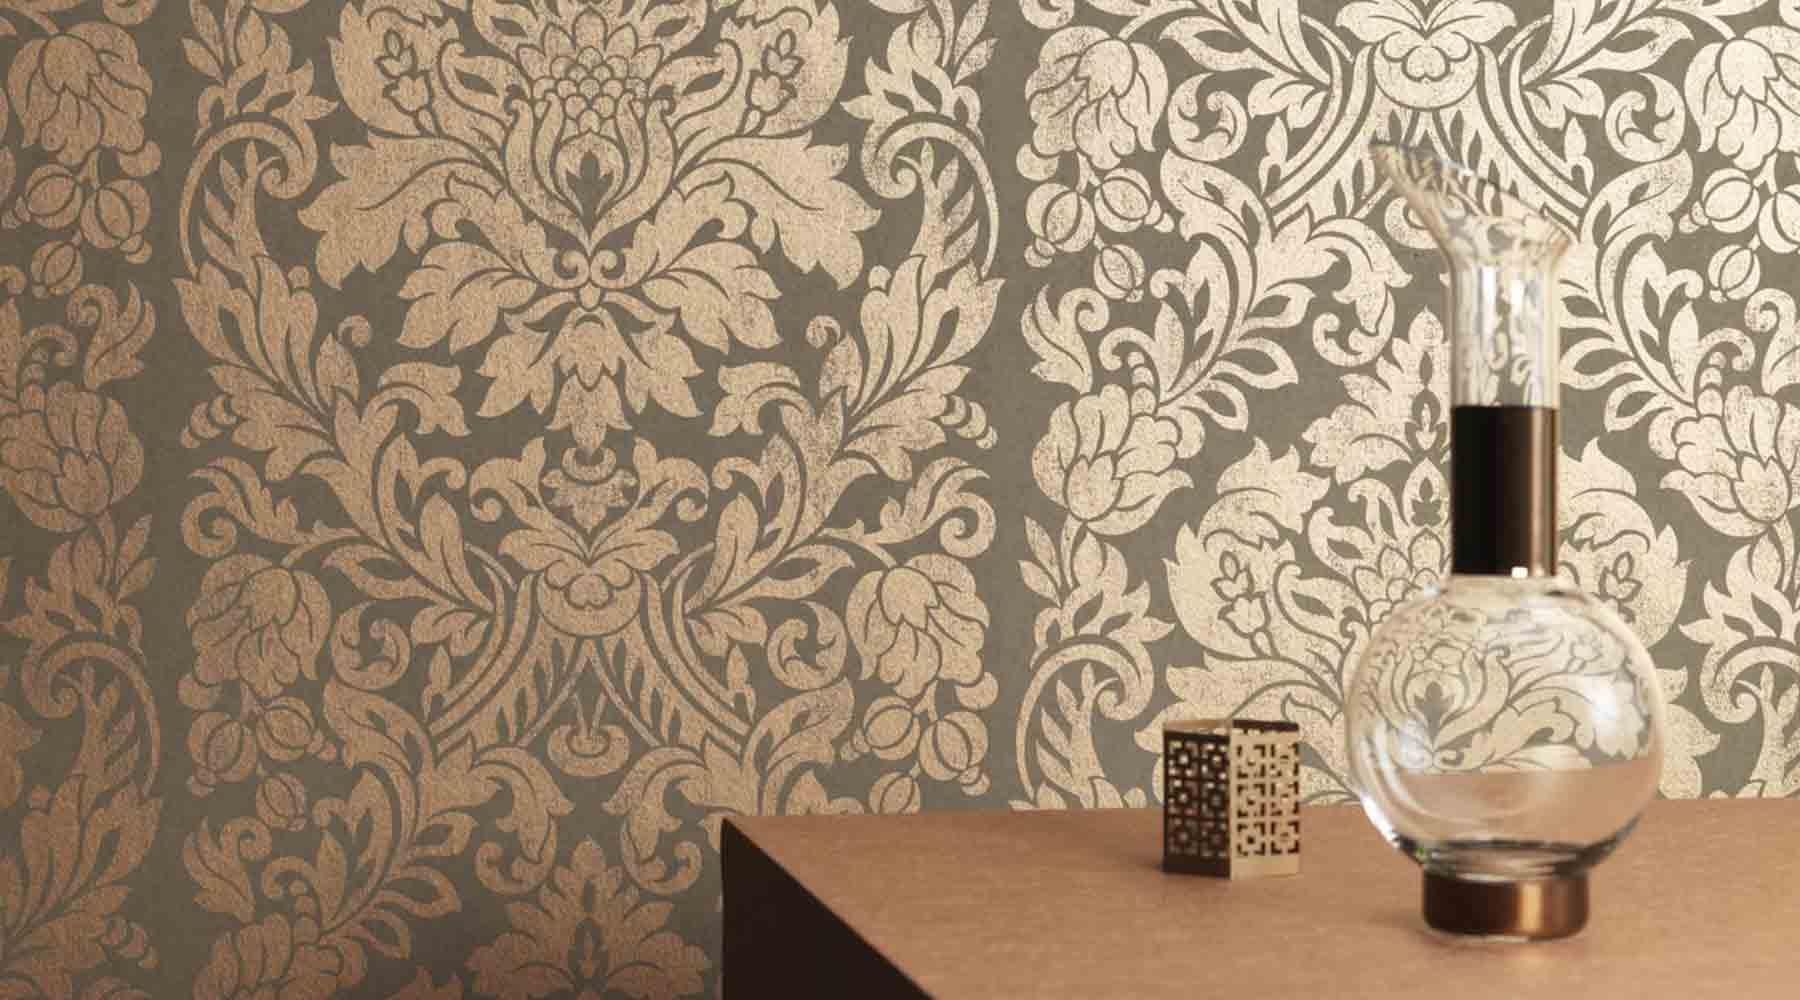 Wallpaper Blog Interior Design Blog Home Decor Blogs 1800x1000